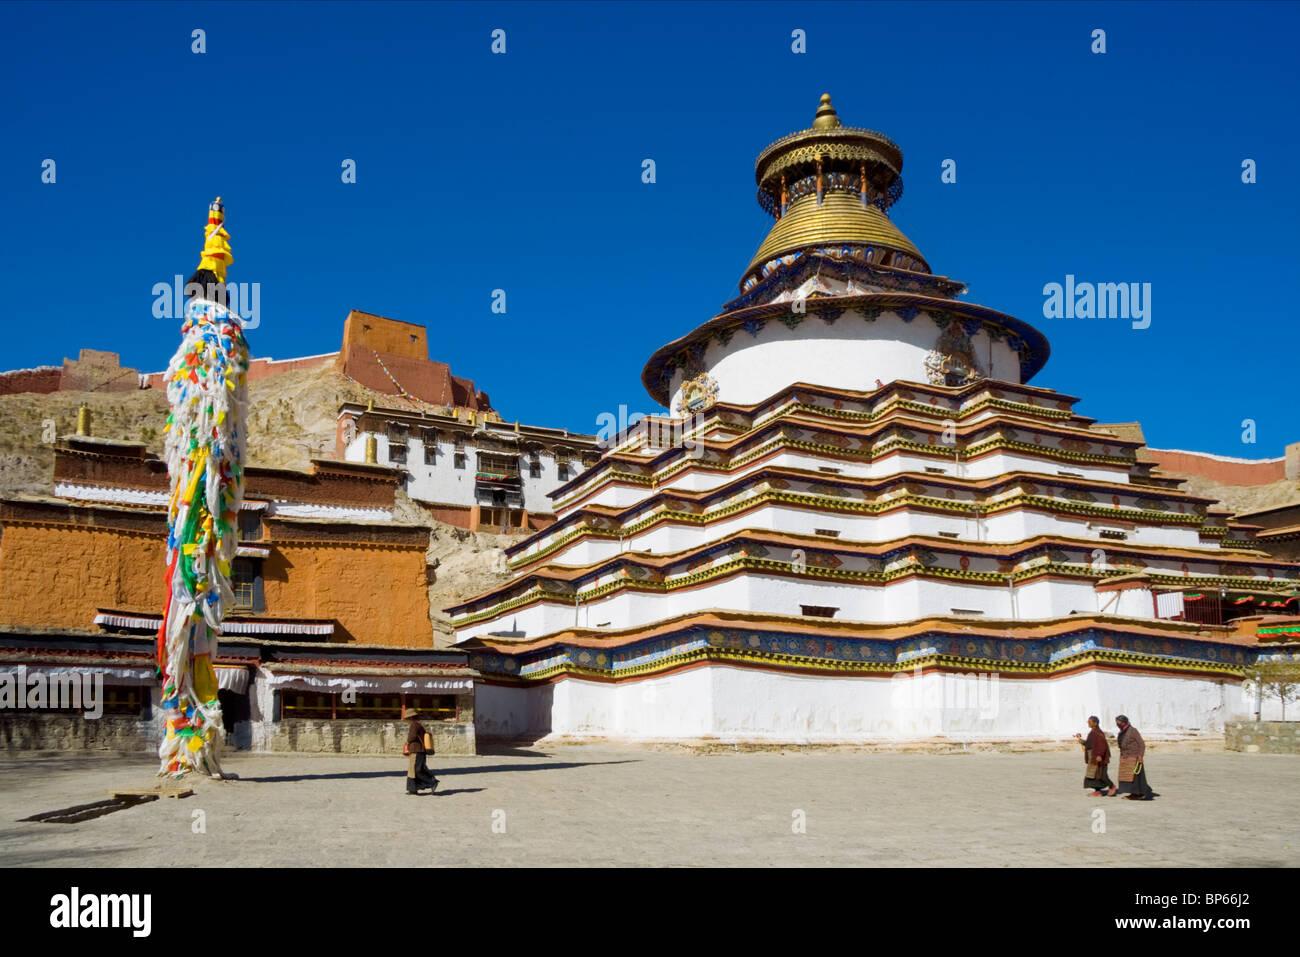 Pango Chorten/Gyantse Kumbum at Pelkor Chode Monastery in Gyantse, Tibet - Stock Image